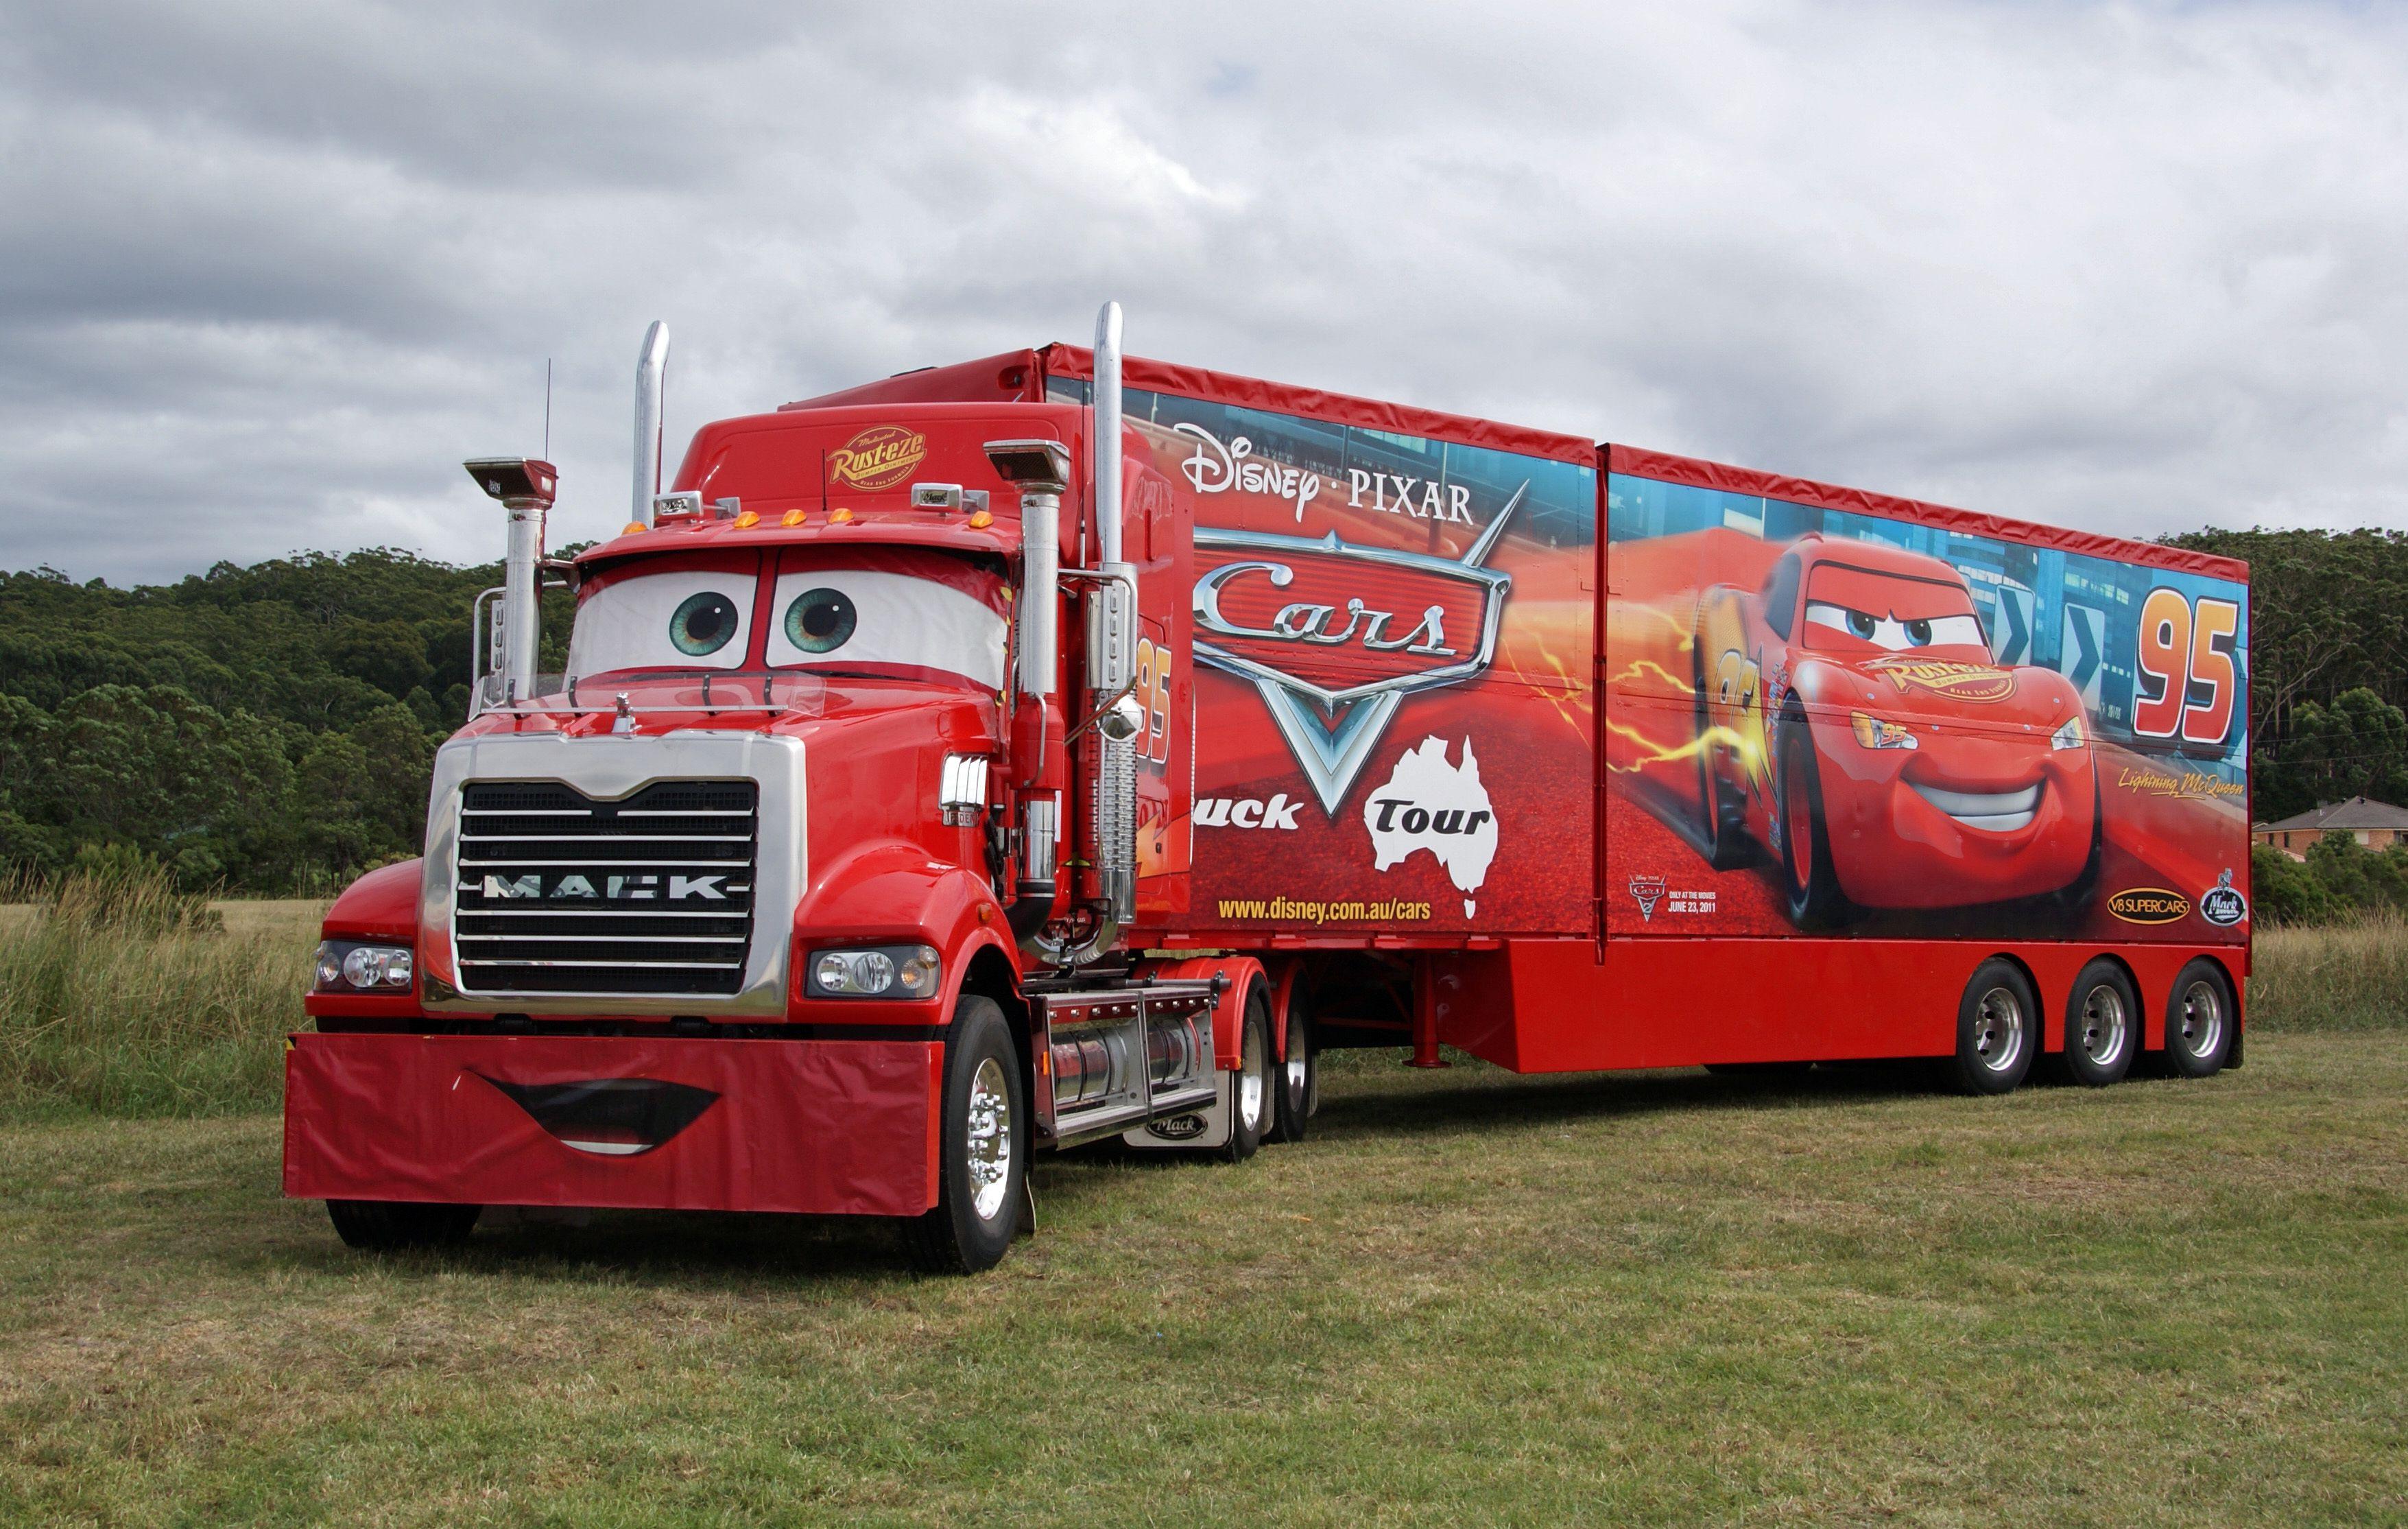 284924 Berserker Jpg 3 511 2 229ピクセル Trucks Mack Trucks Big Trucks